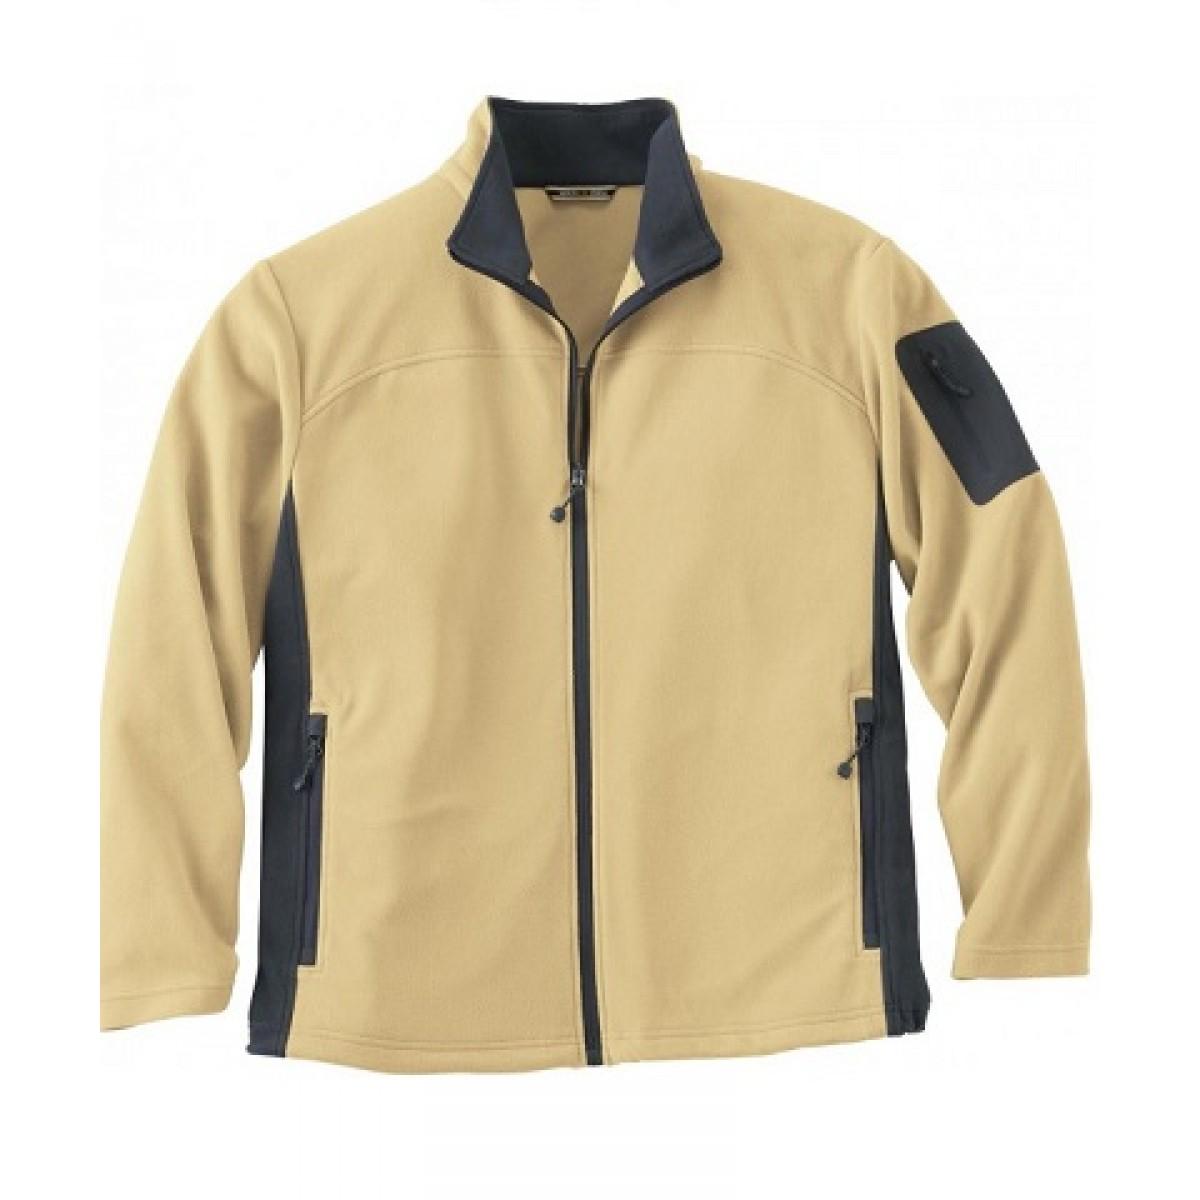 Men's Microfleece Jacket Caramel -L